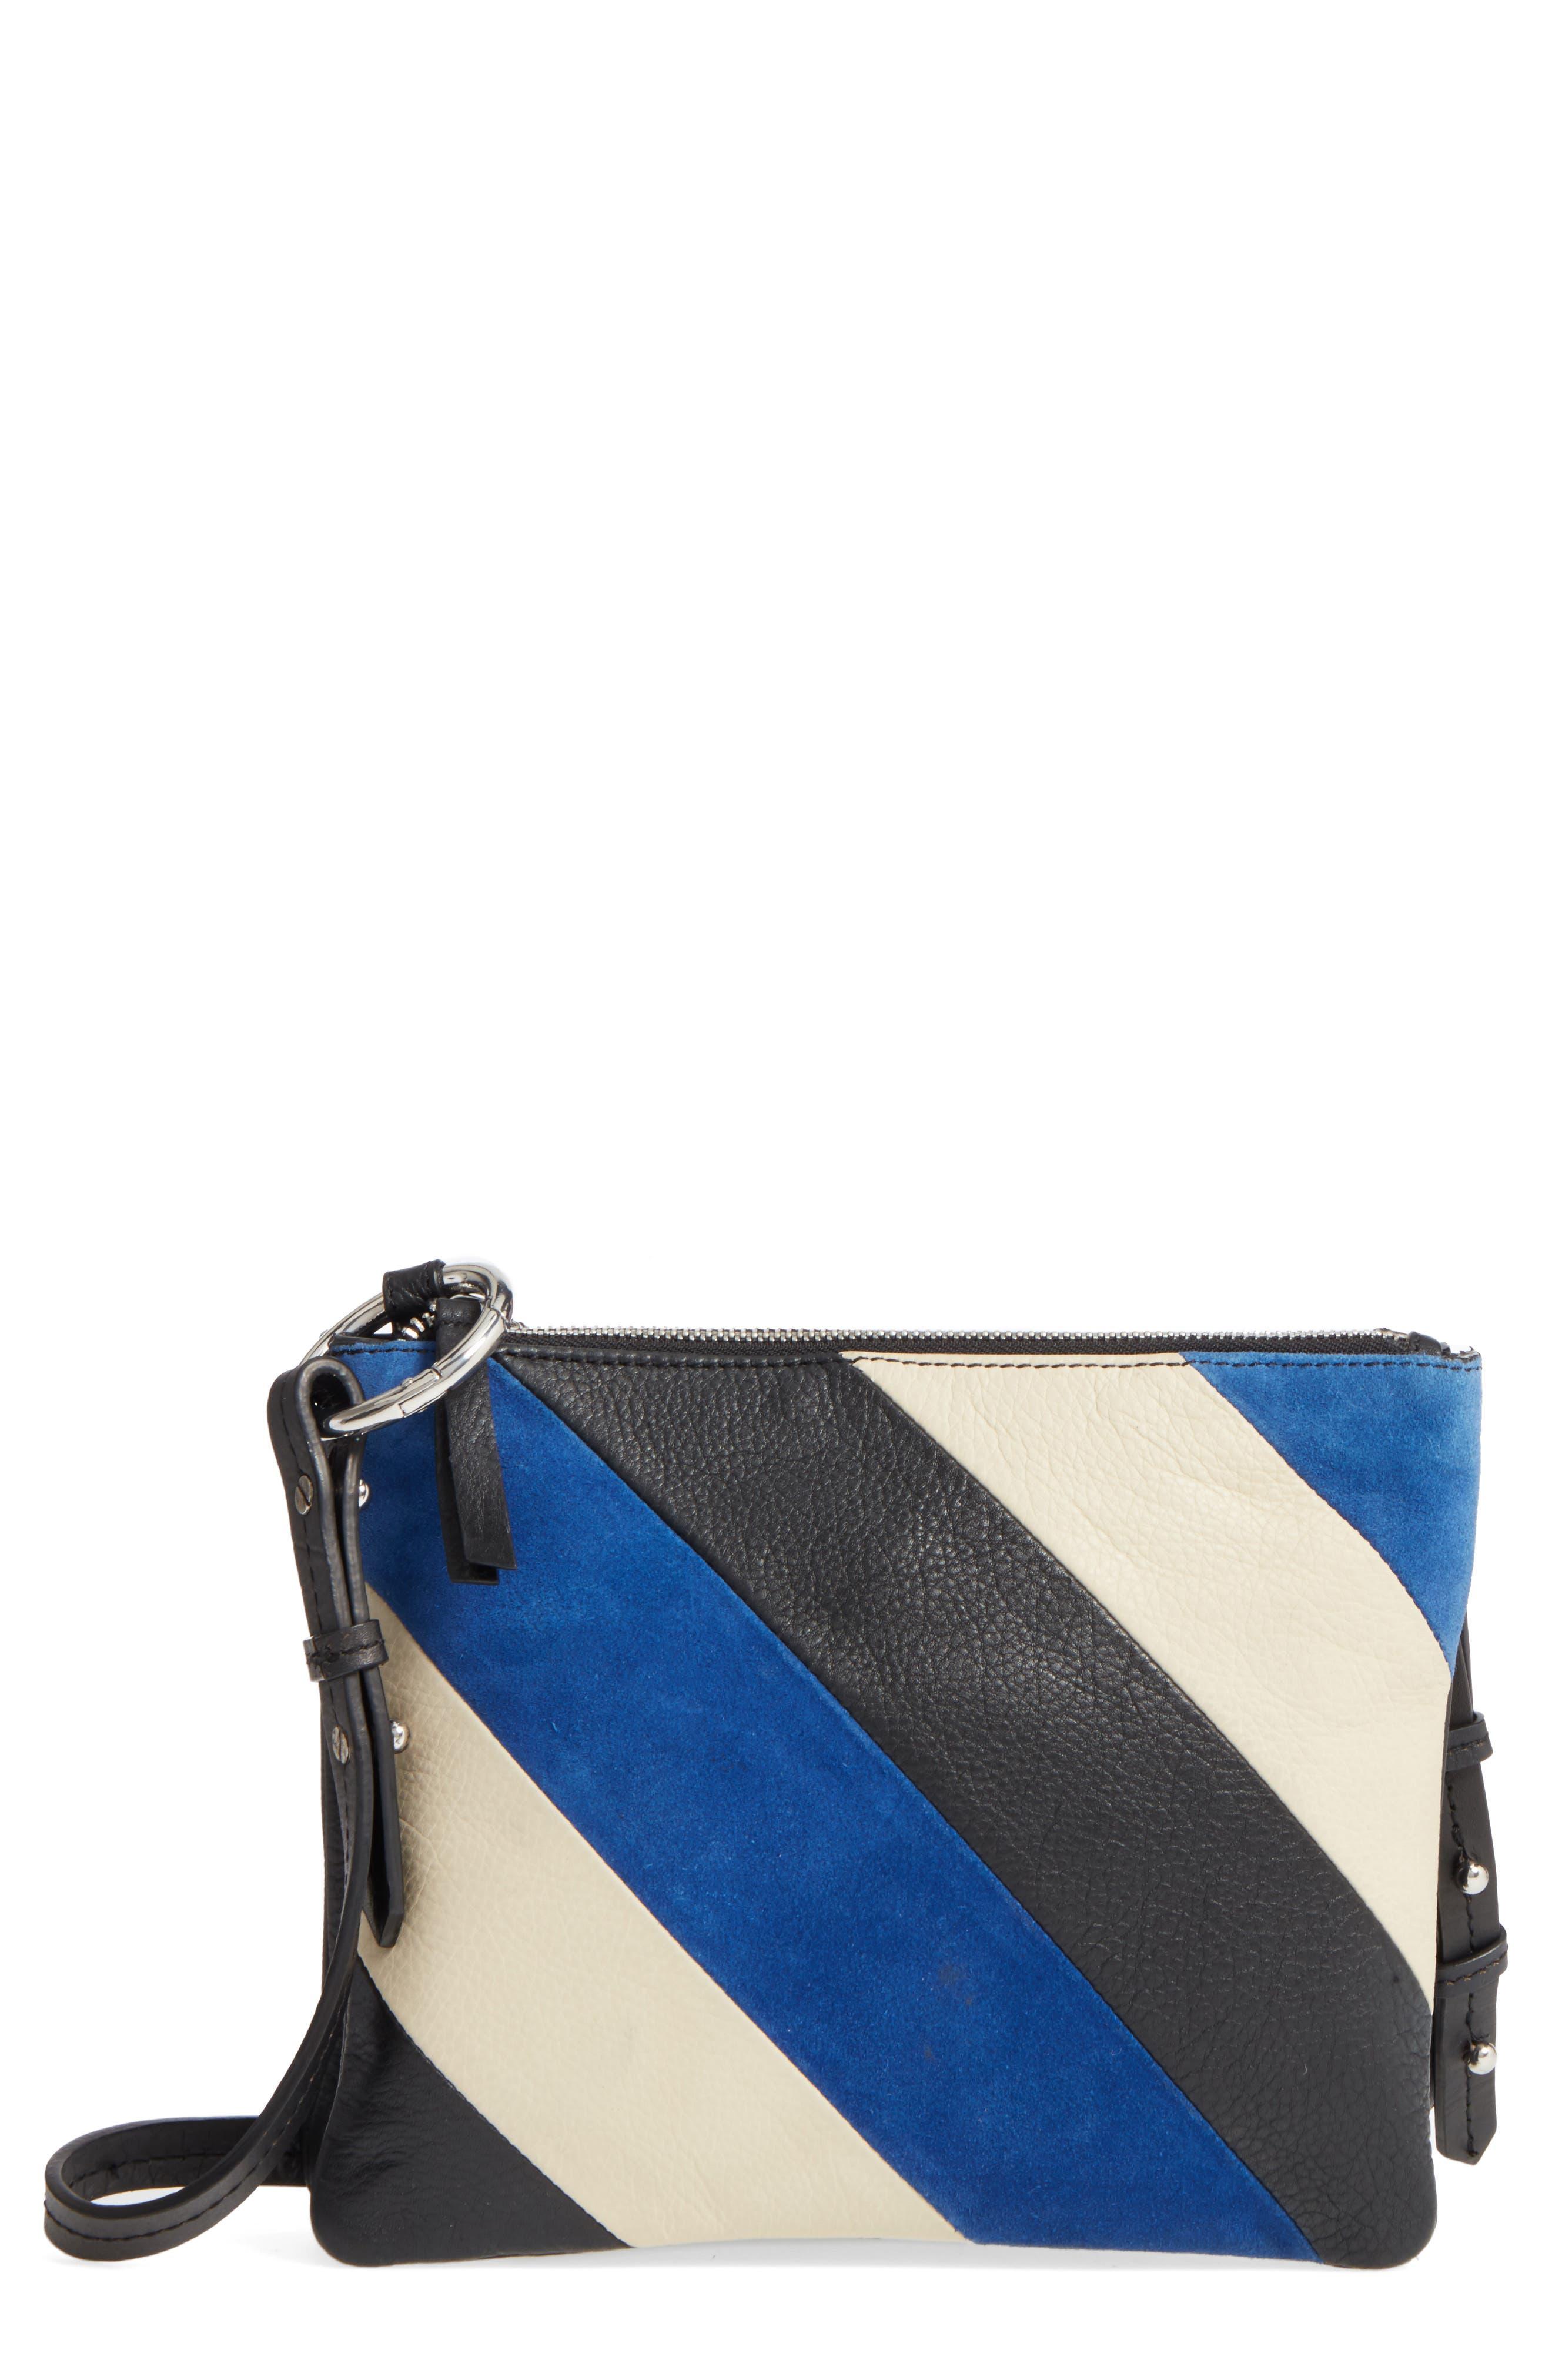 Topshop Premium Leather Bridget Crossbody Bag